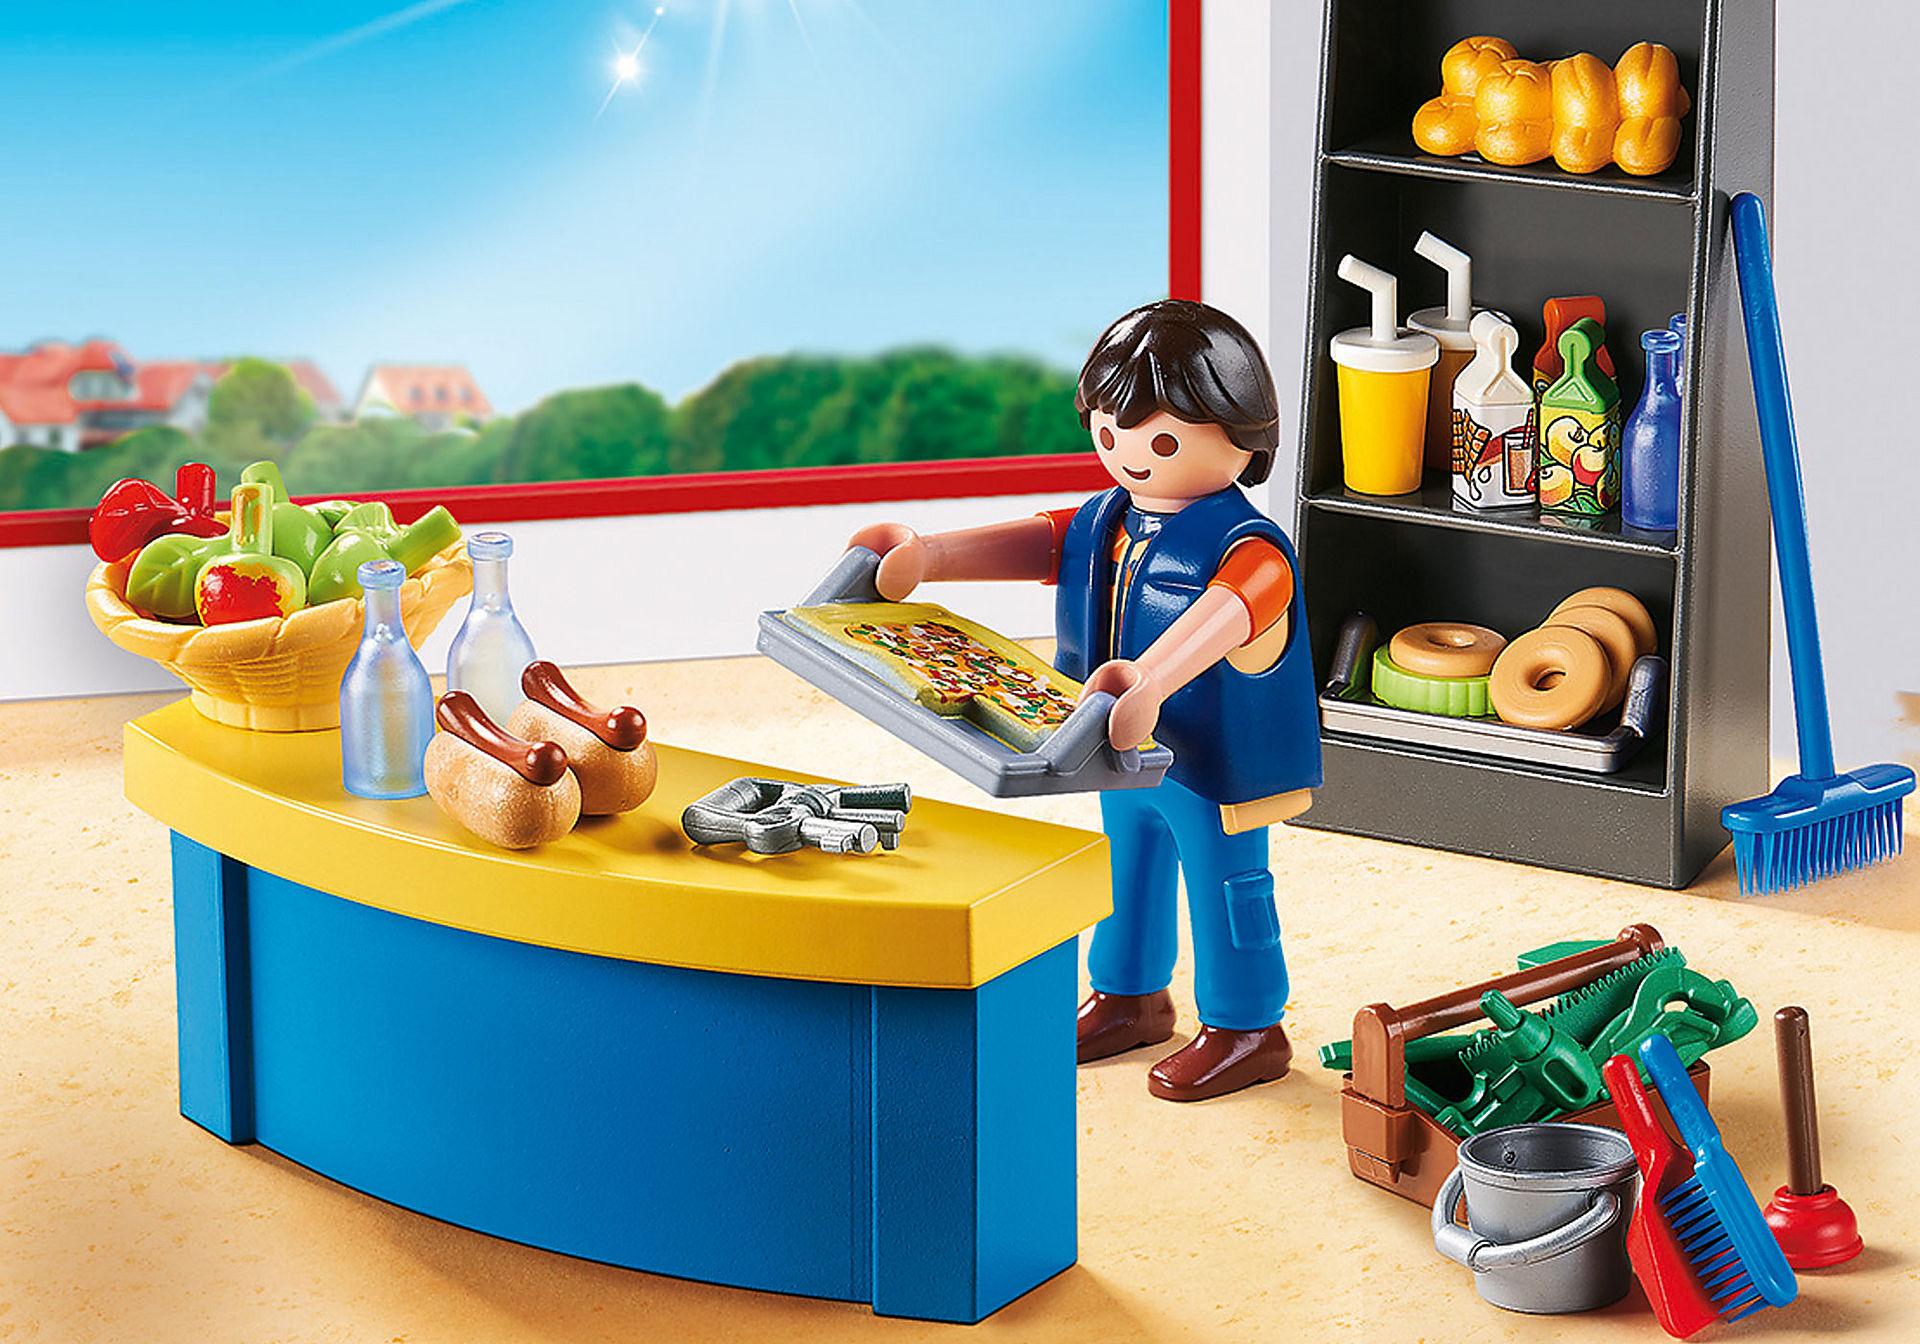 http://media.playmobil.com/i/playmobil/9457_product_detail/Hausmeister mit Kiosk